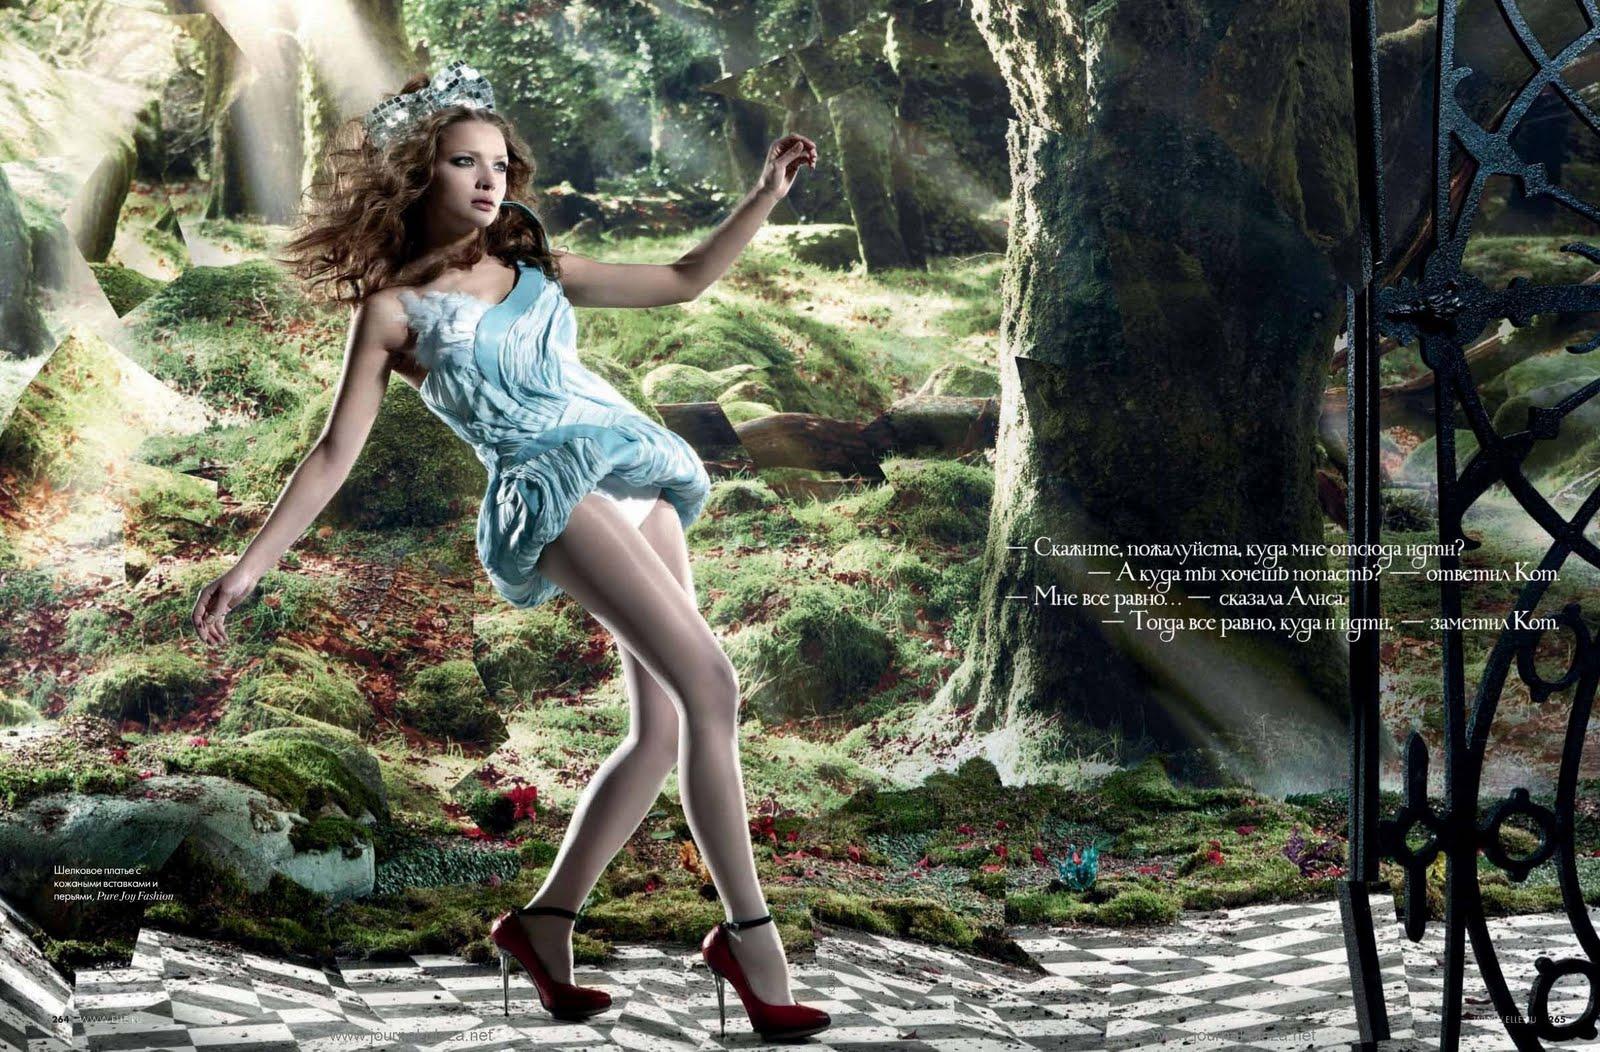 Юлия зимина фото в журнале 27 фотография